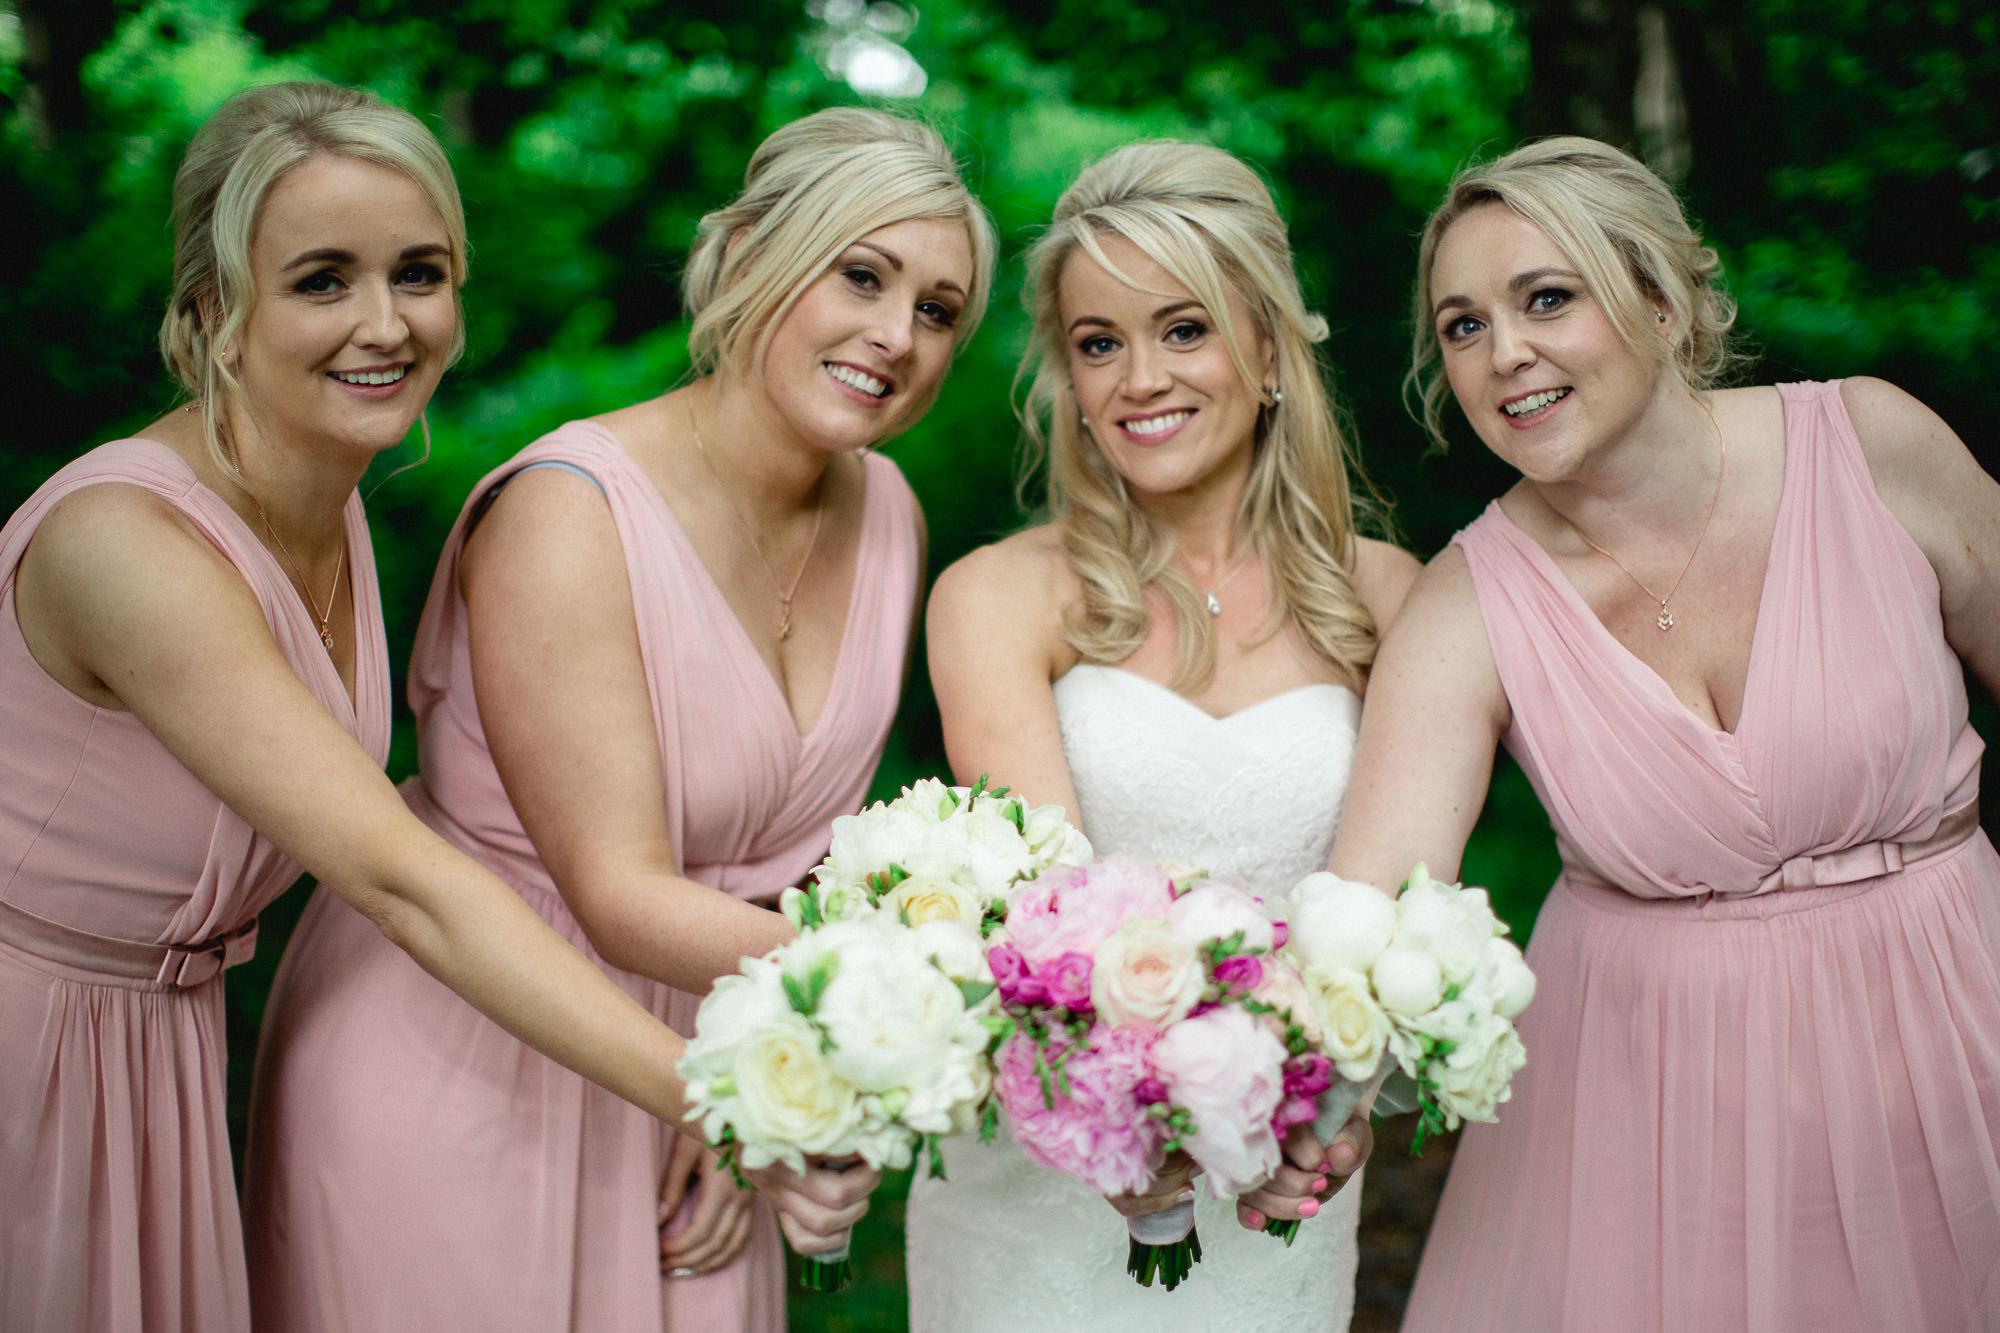 CLAIREBYRNEPHOTOGRAPHY-WEDDING-Ireland-tulffaris-alternative-fun-Lisa-terry-12.jpg